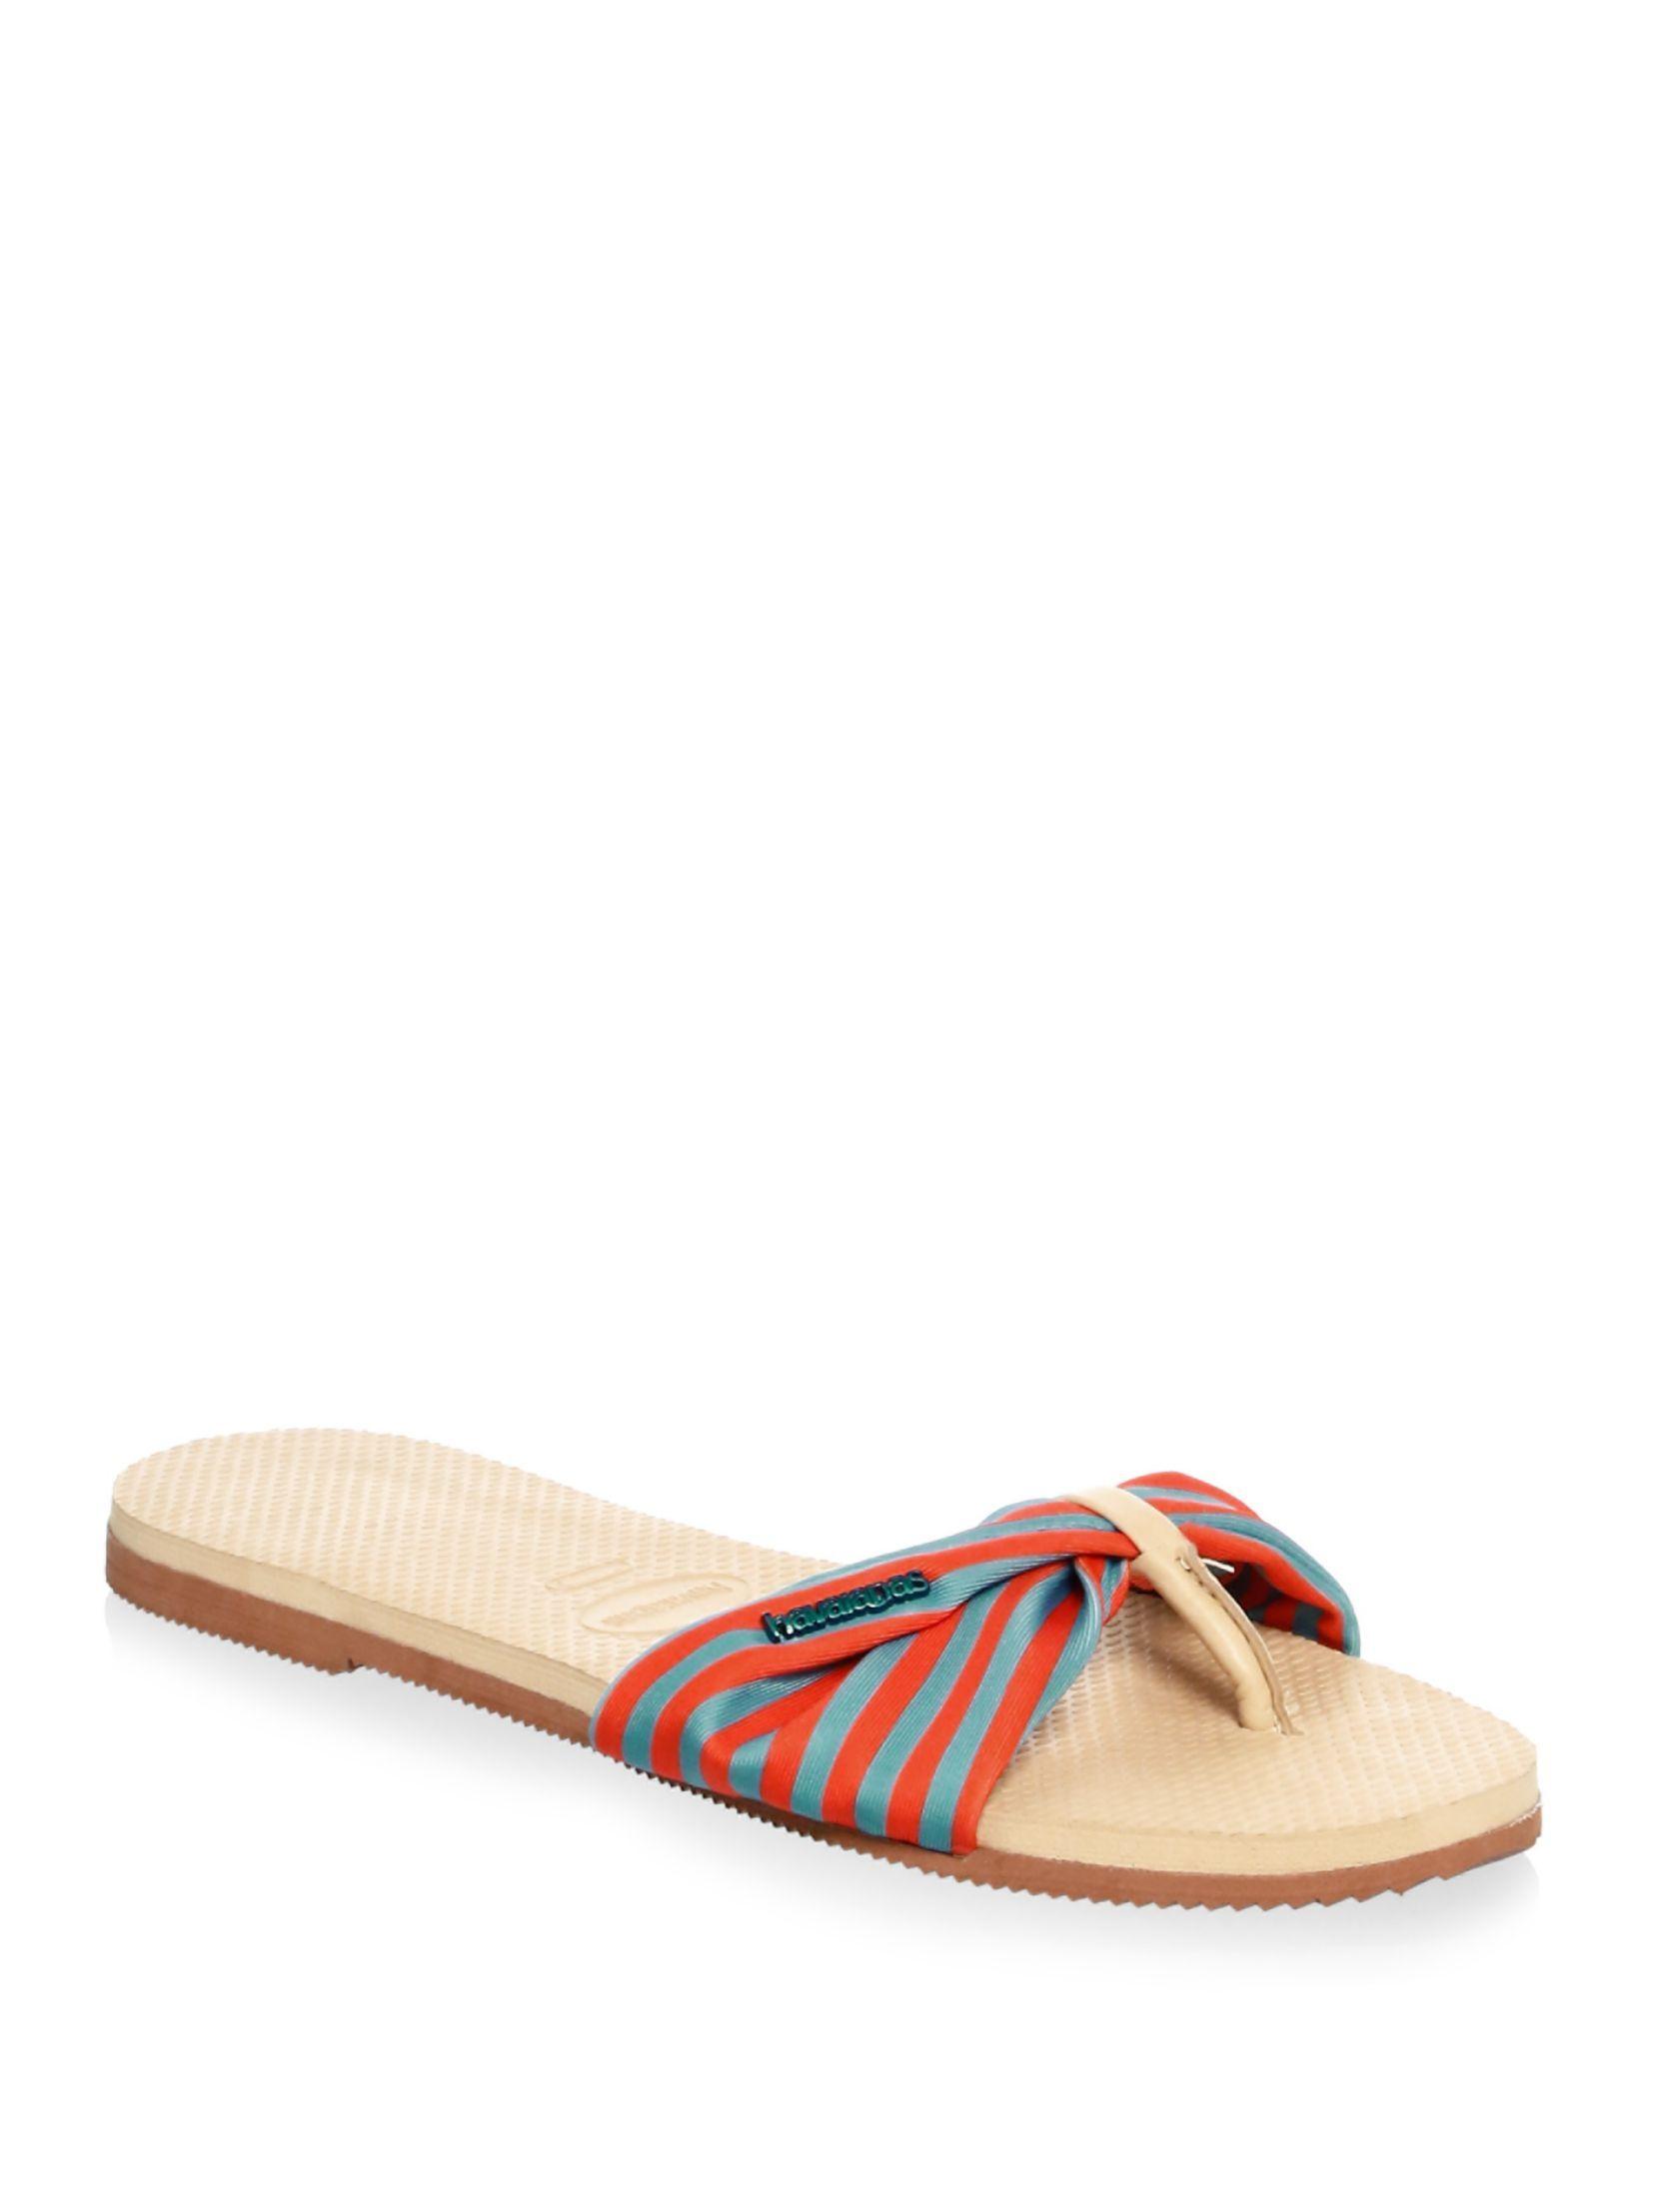 f79ba649d2 Havaianas Floral-Print Cinched Sandals